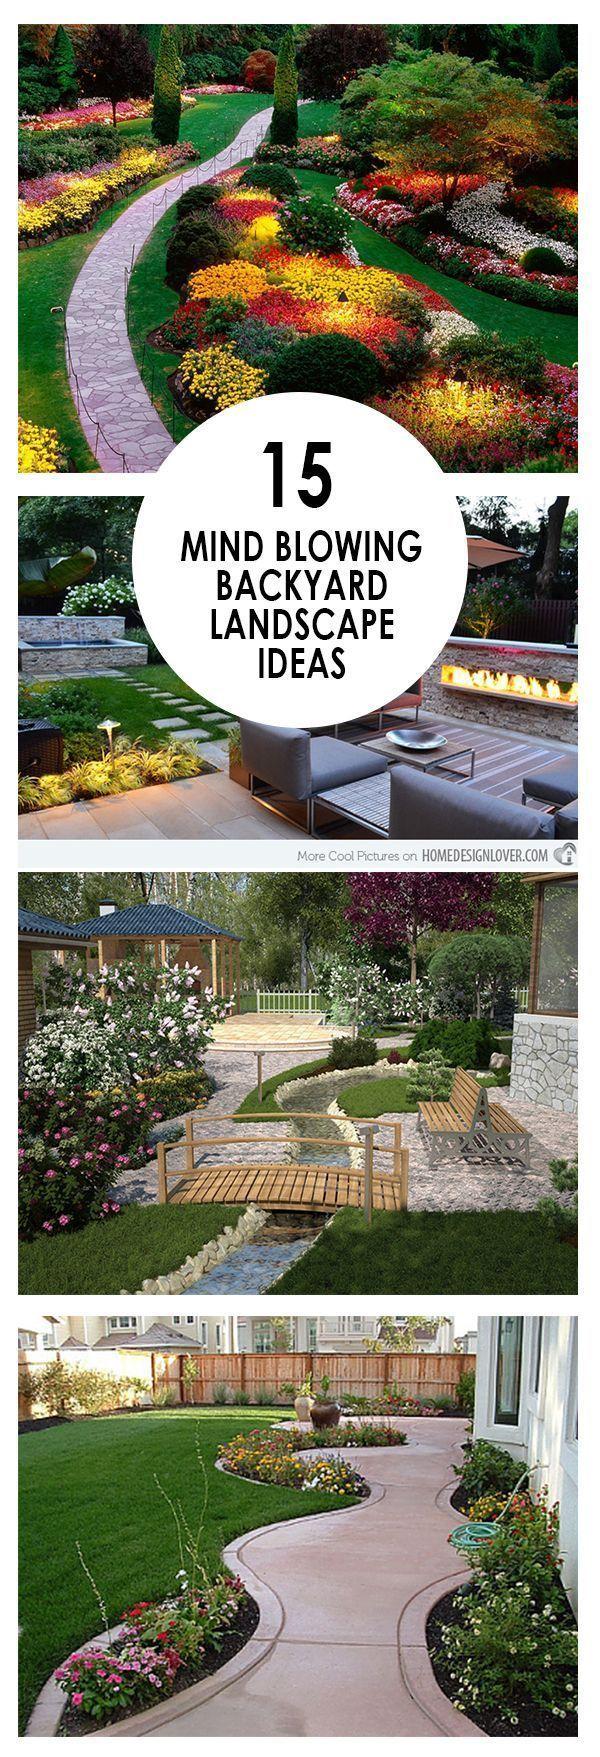 15 Mind-Blowing Backyard Landscape Ideas - Page 10 of 17 ...